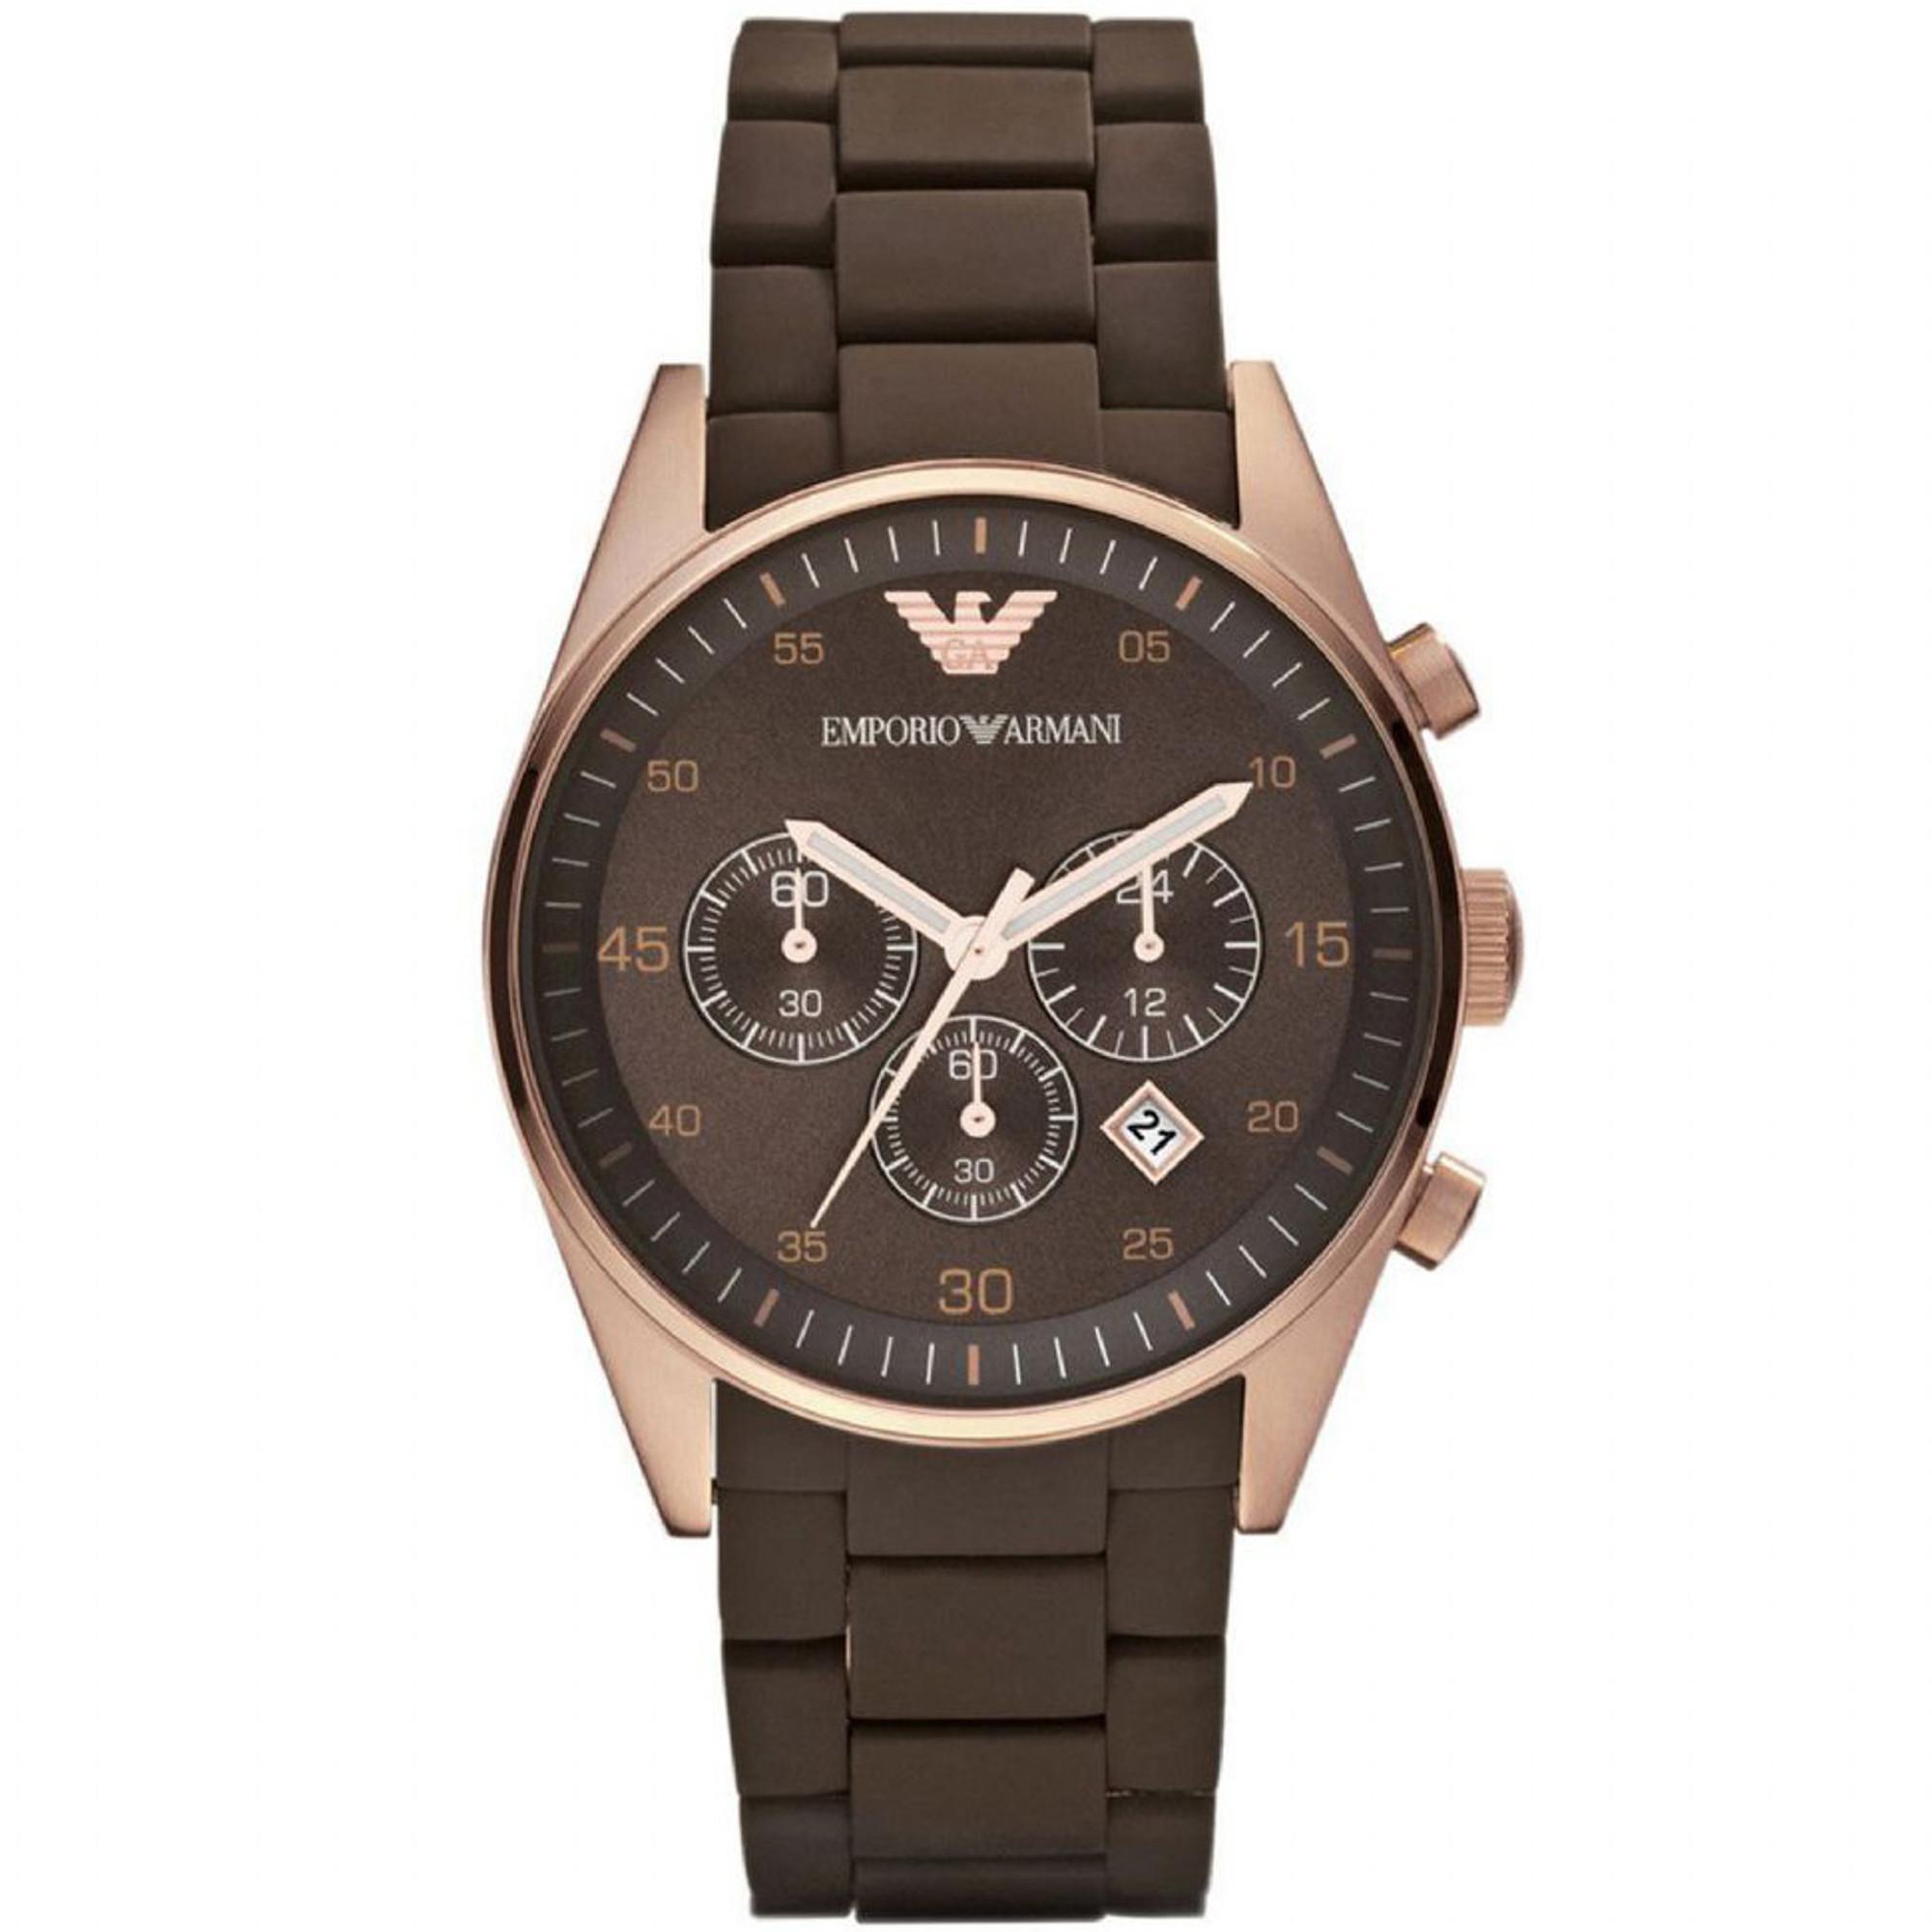 EMPORIO ARMANI Sportivo Watch Chronograph AR5890